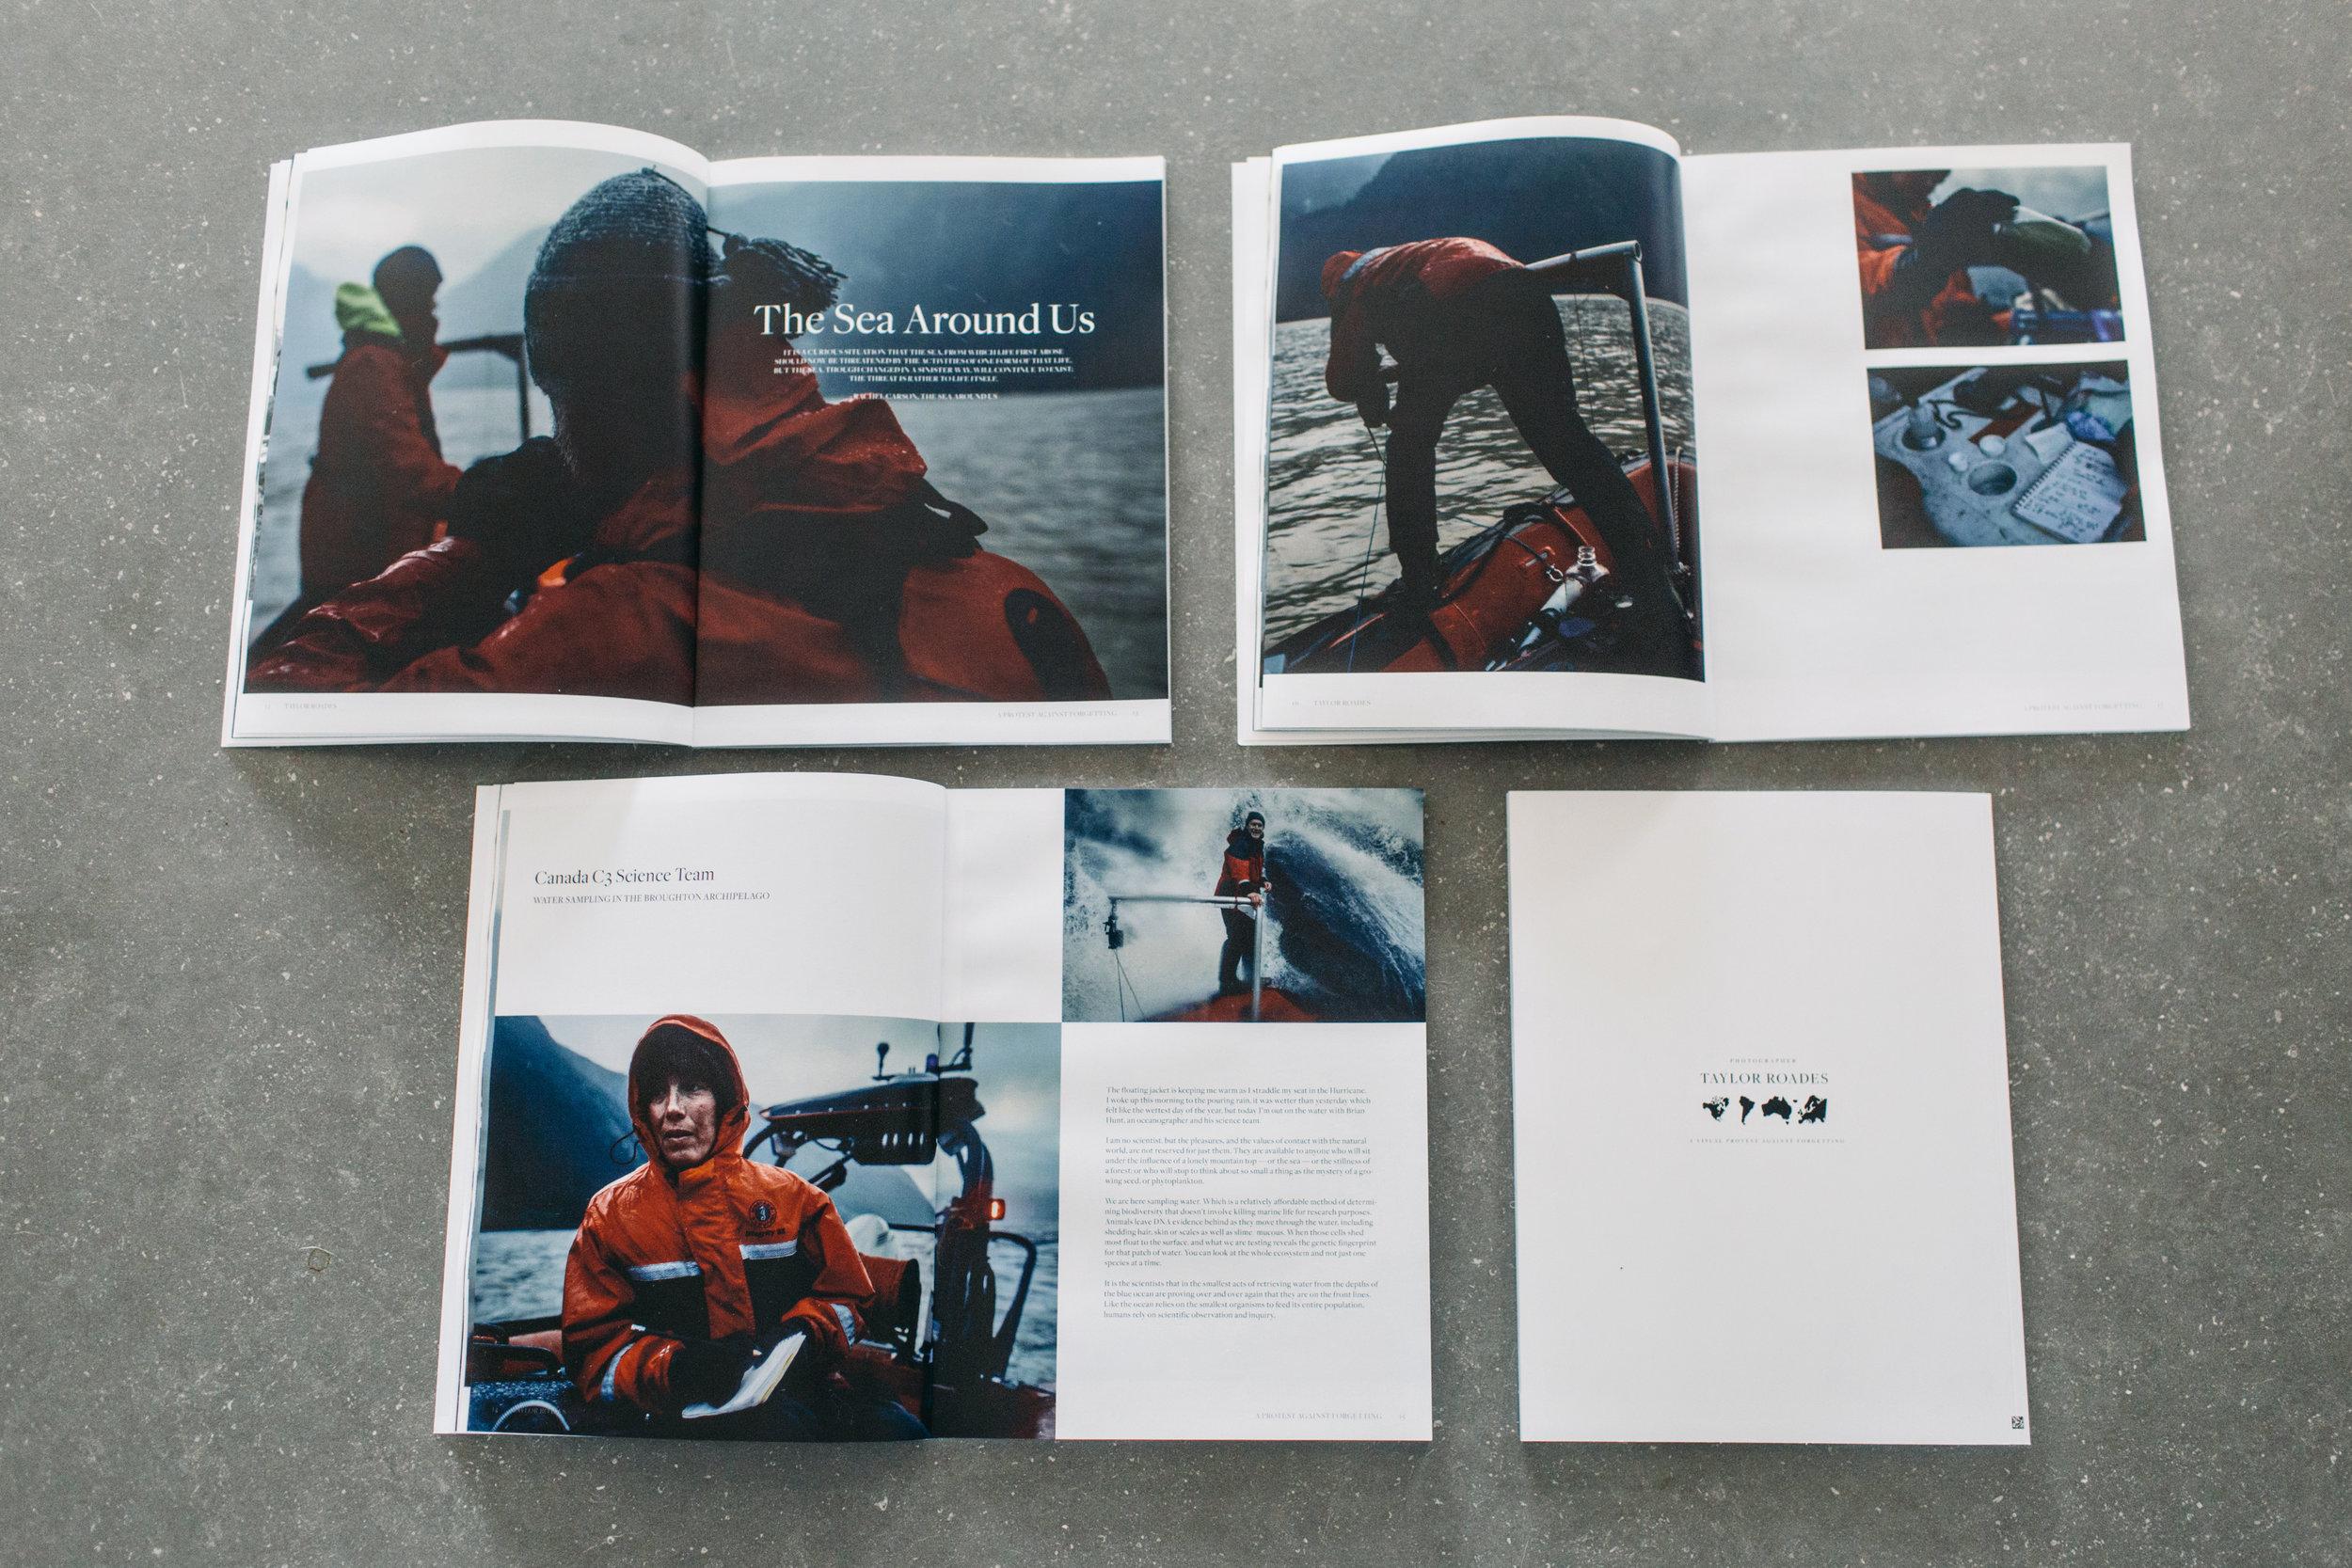 Promo-Books-Photos-TaylorRoades-0037.JPG